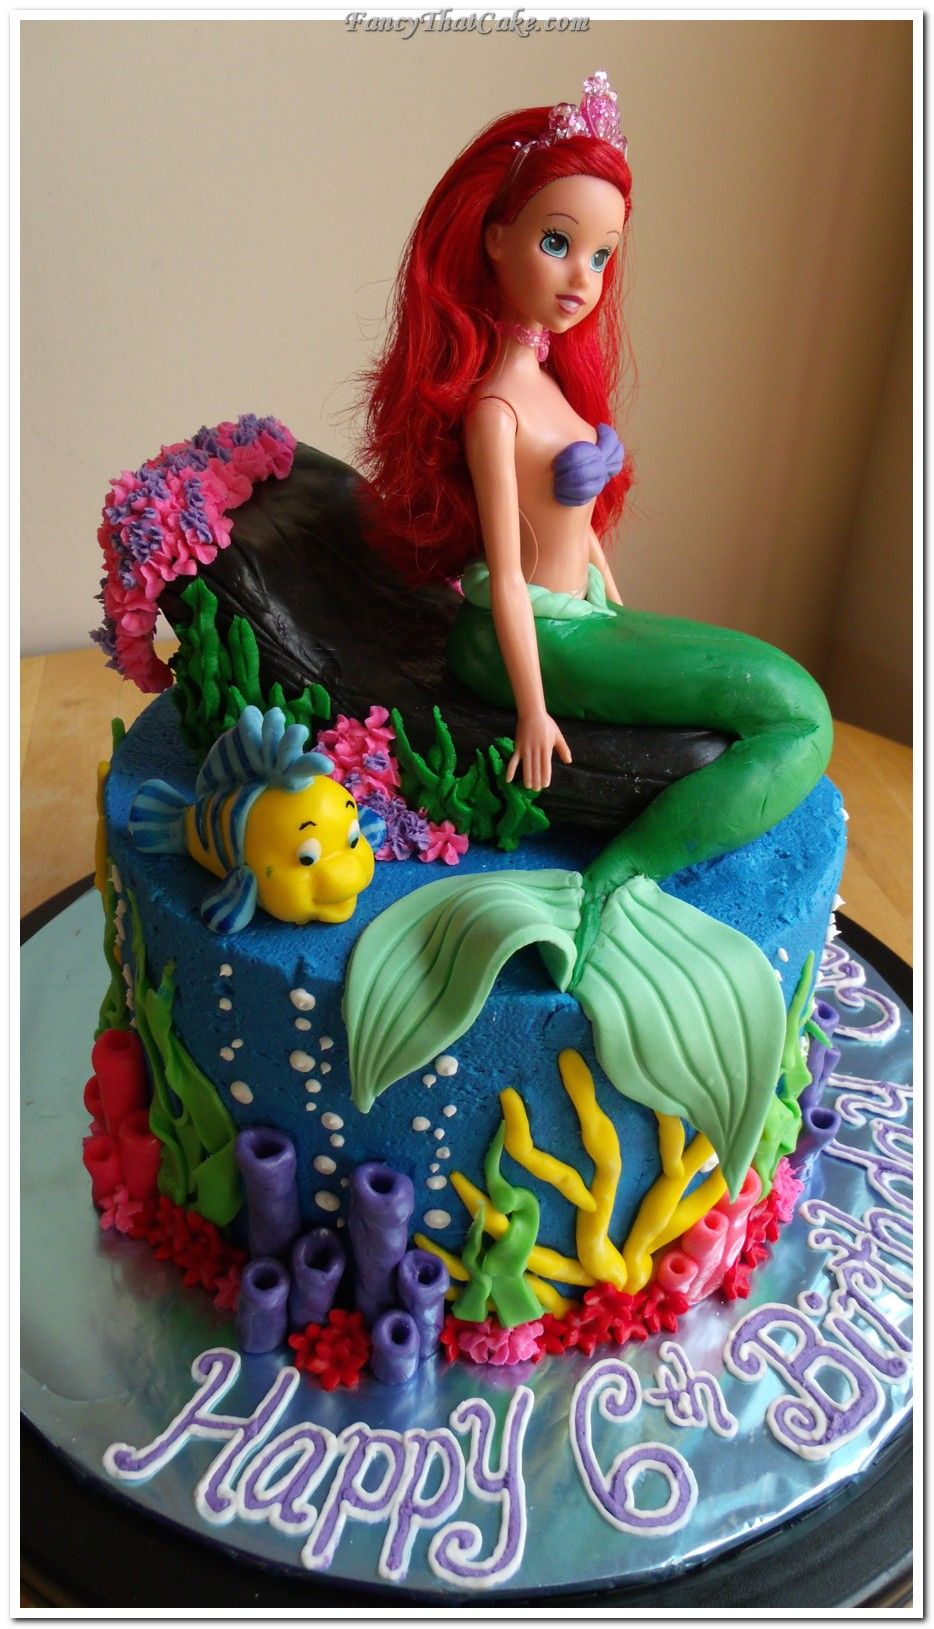 Ariel_Little_Mermaid_cake.jpg 934×1,629 pixels